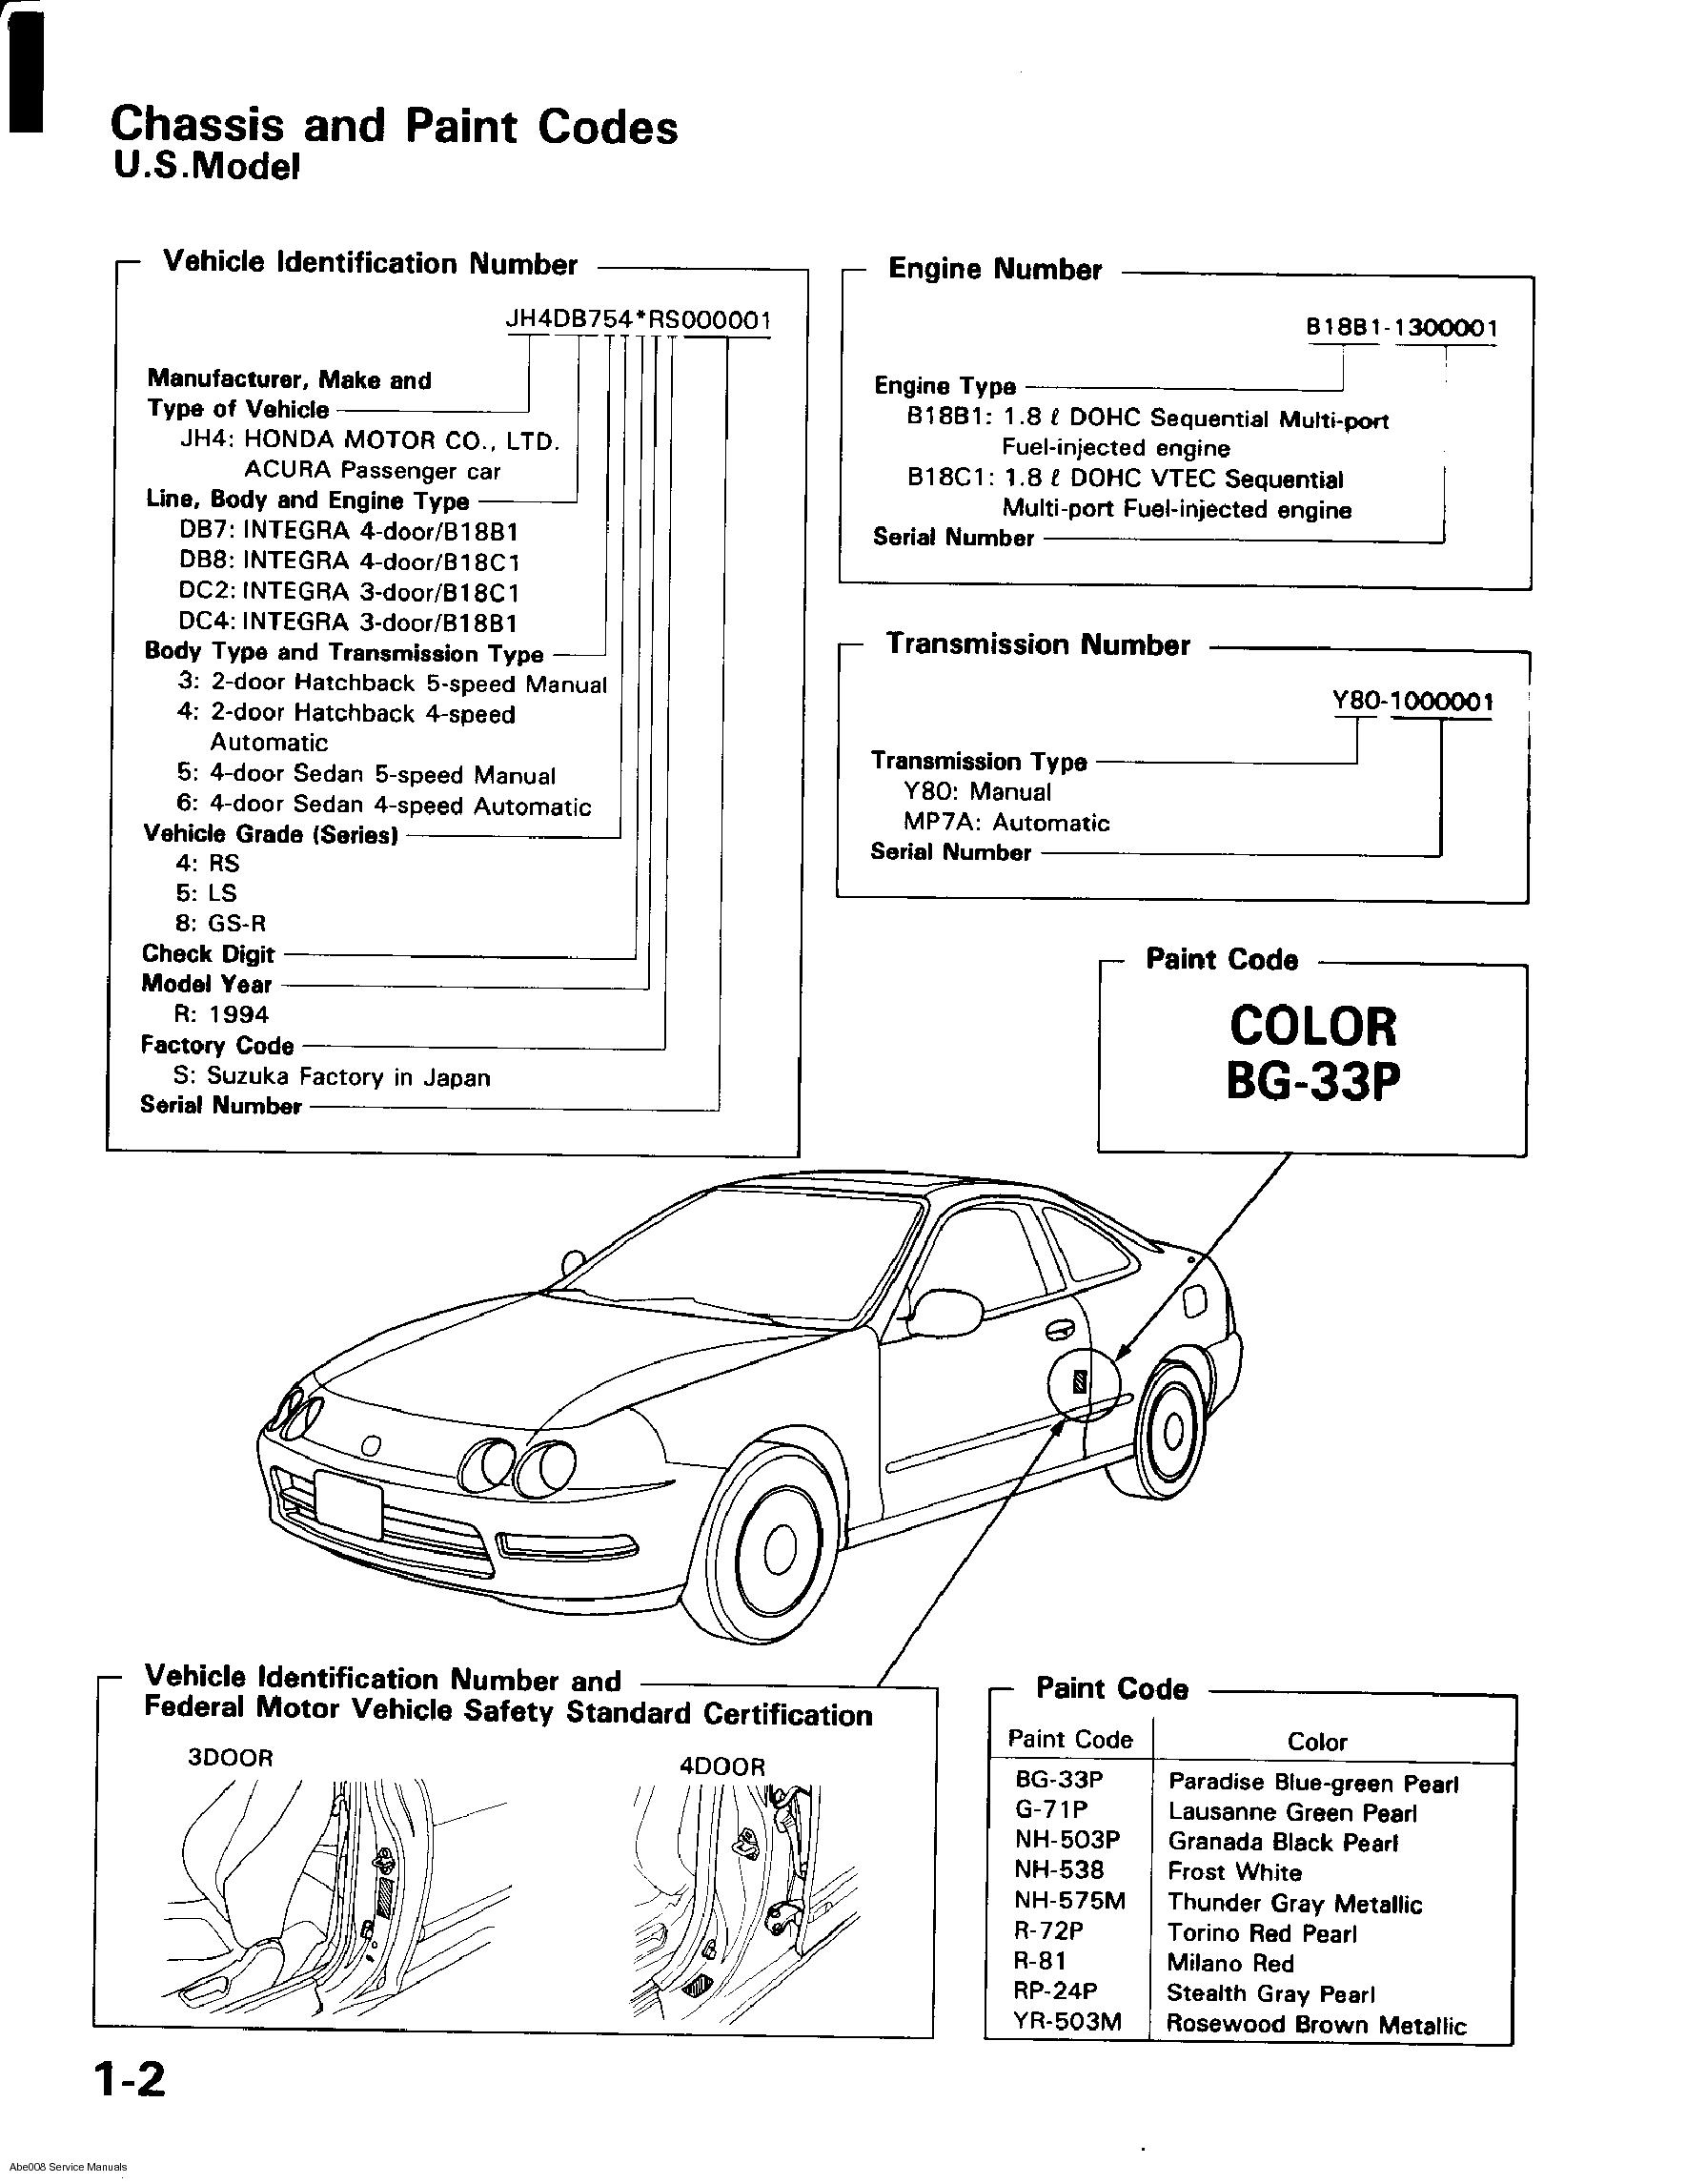 Acura Integra Service Manual Download Free Software